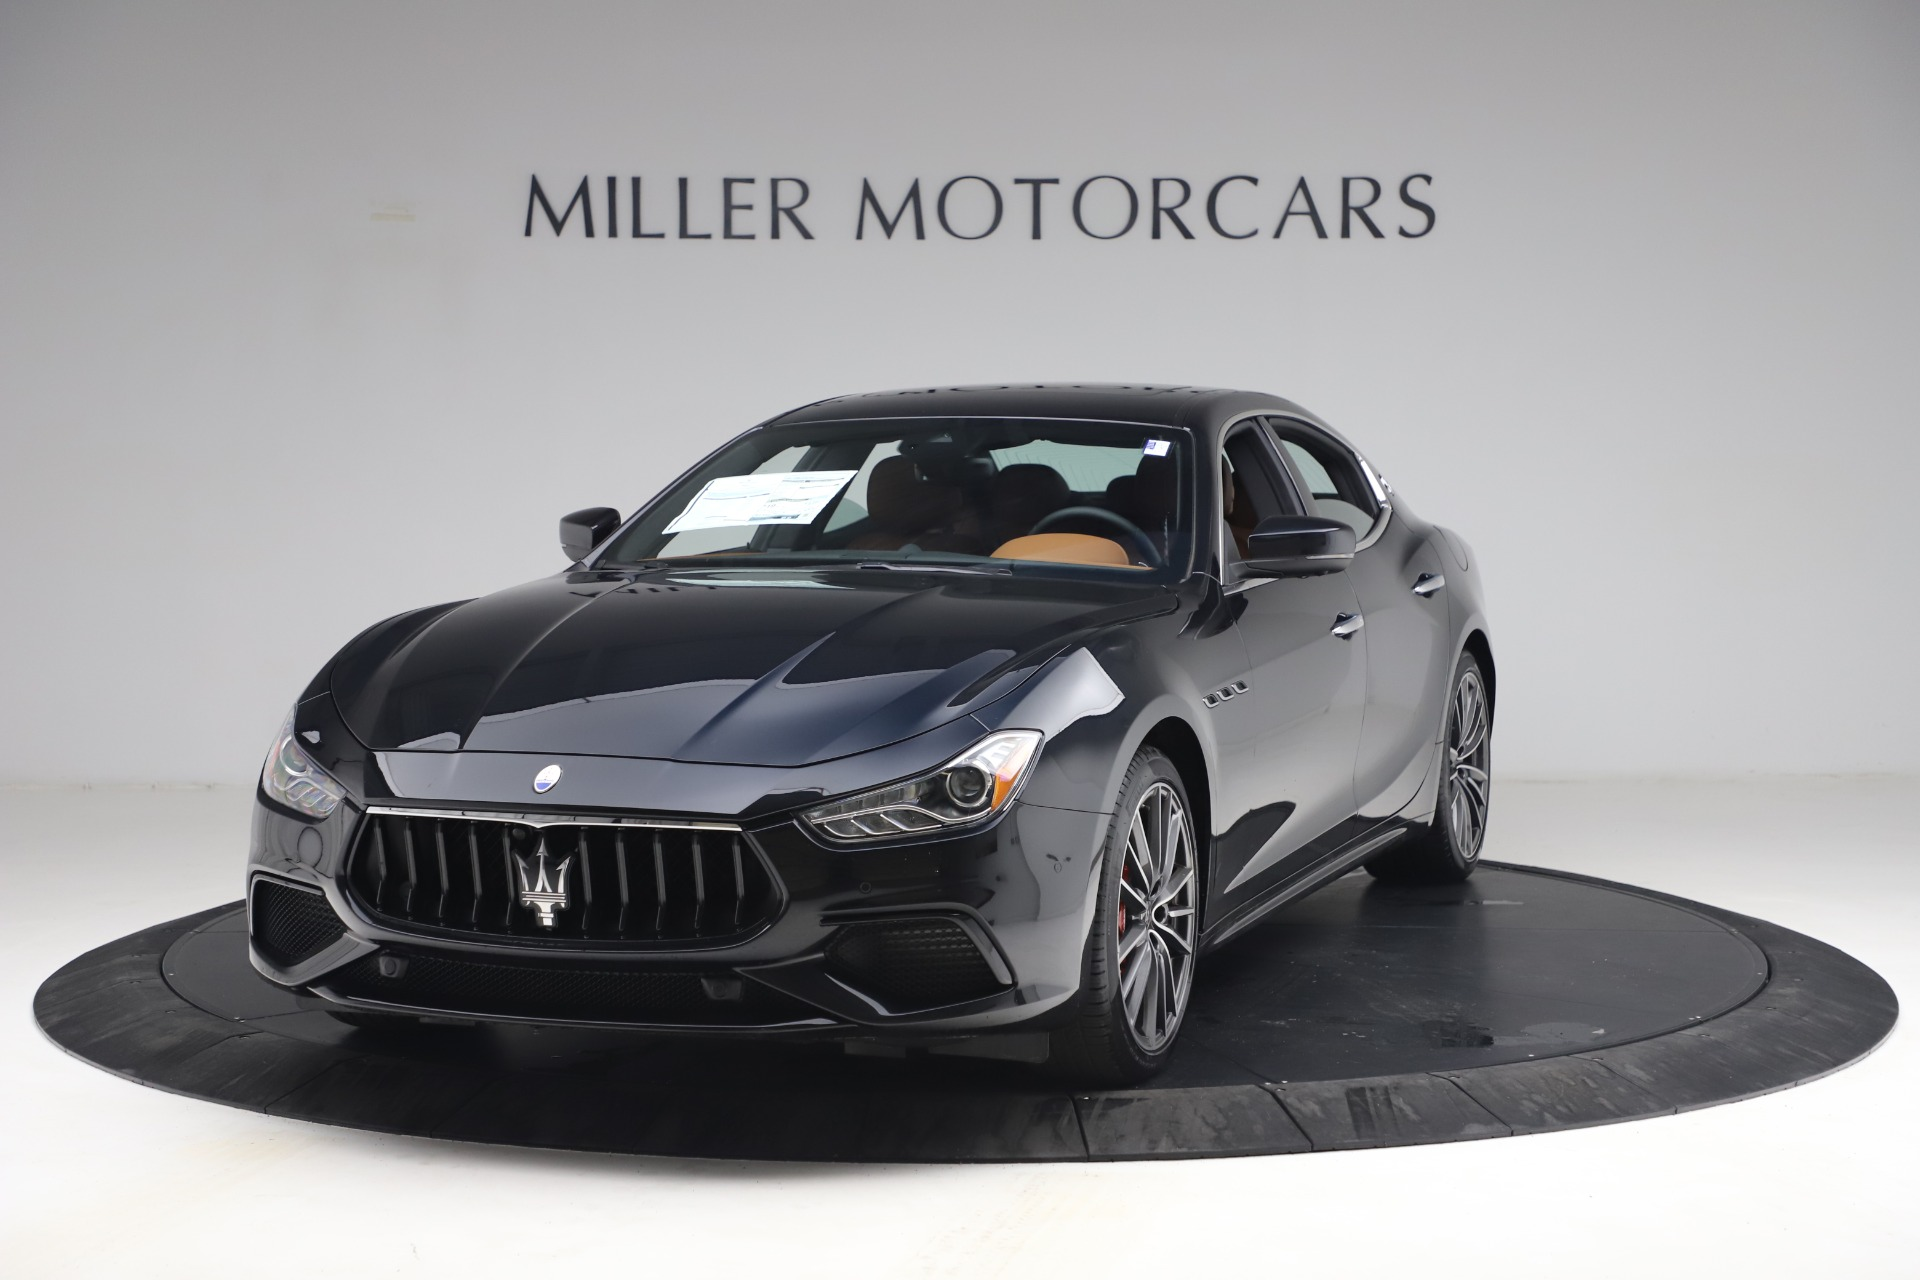 New 2021 Maserati Ghibli S Q4 for sale $90,675 at McLaren Greenwich in Greenwich CT 06830 1